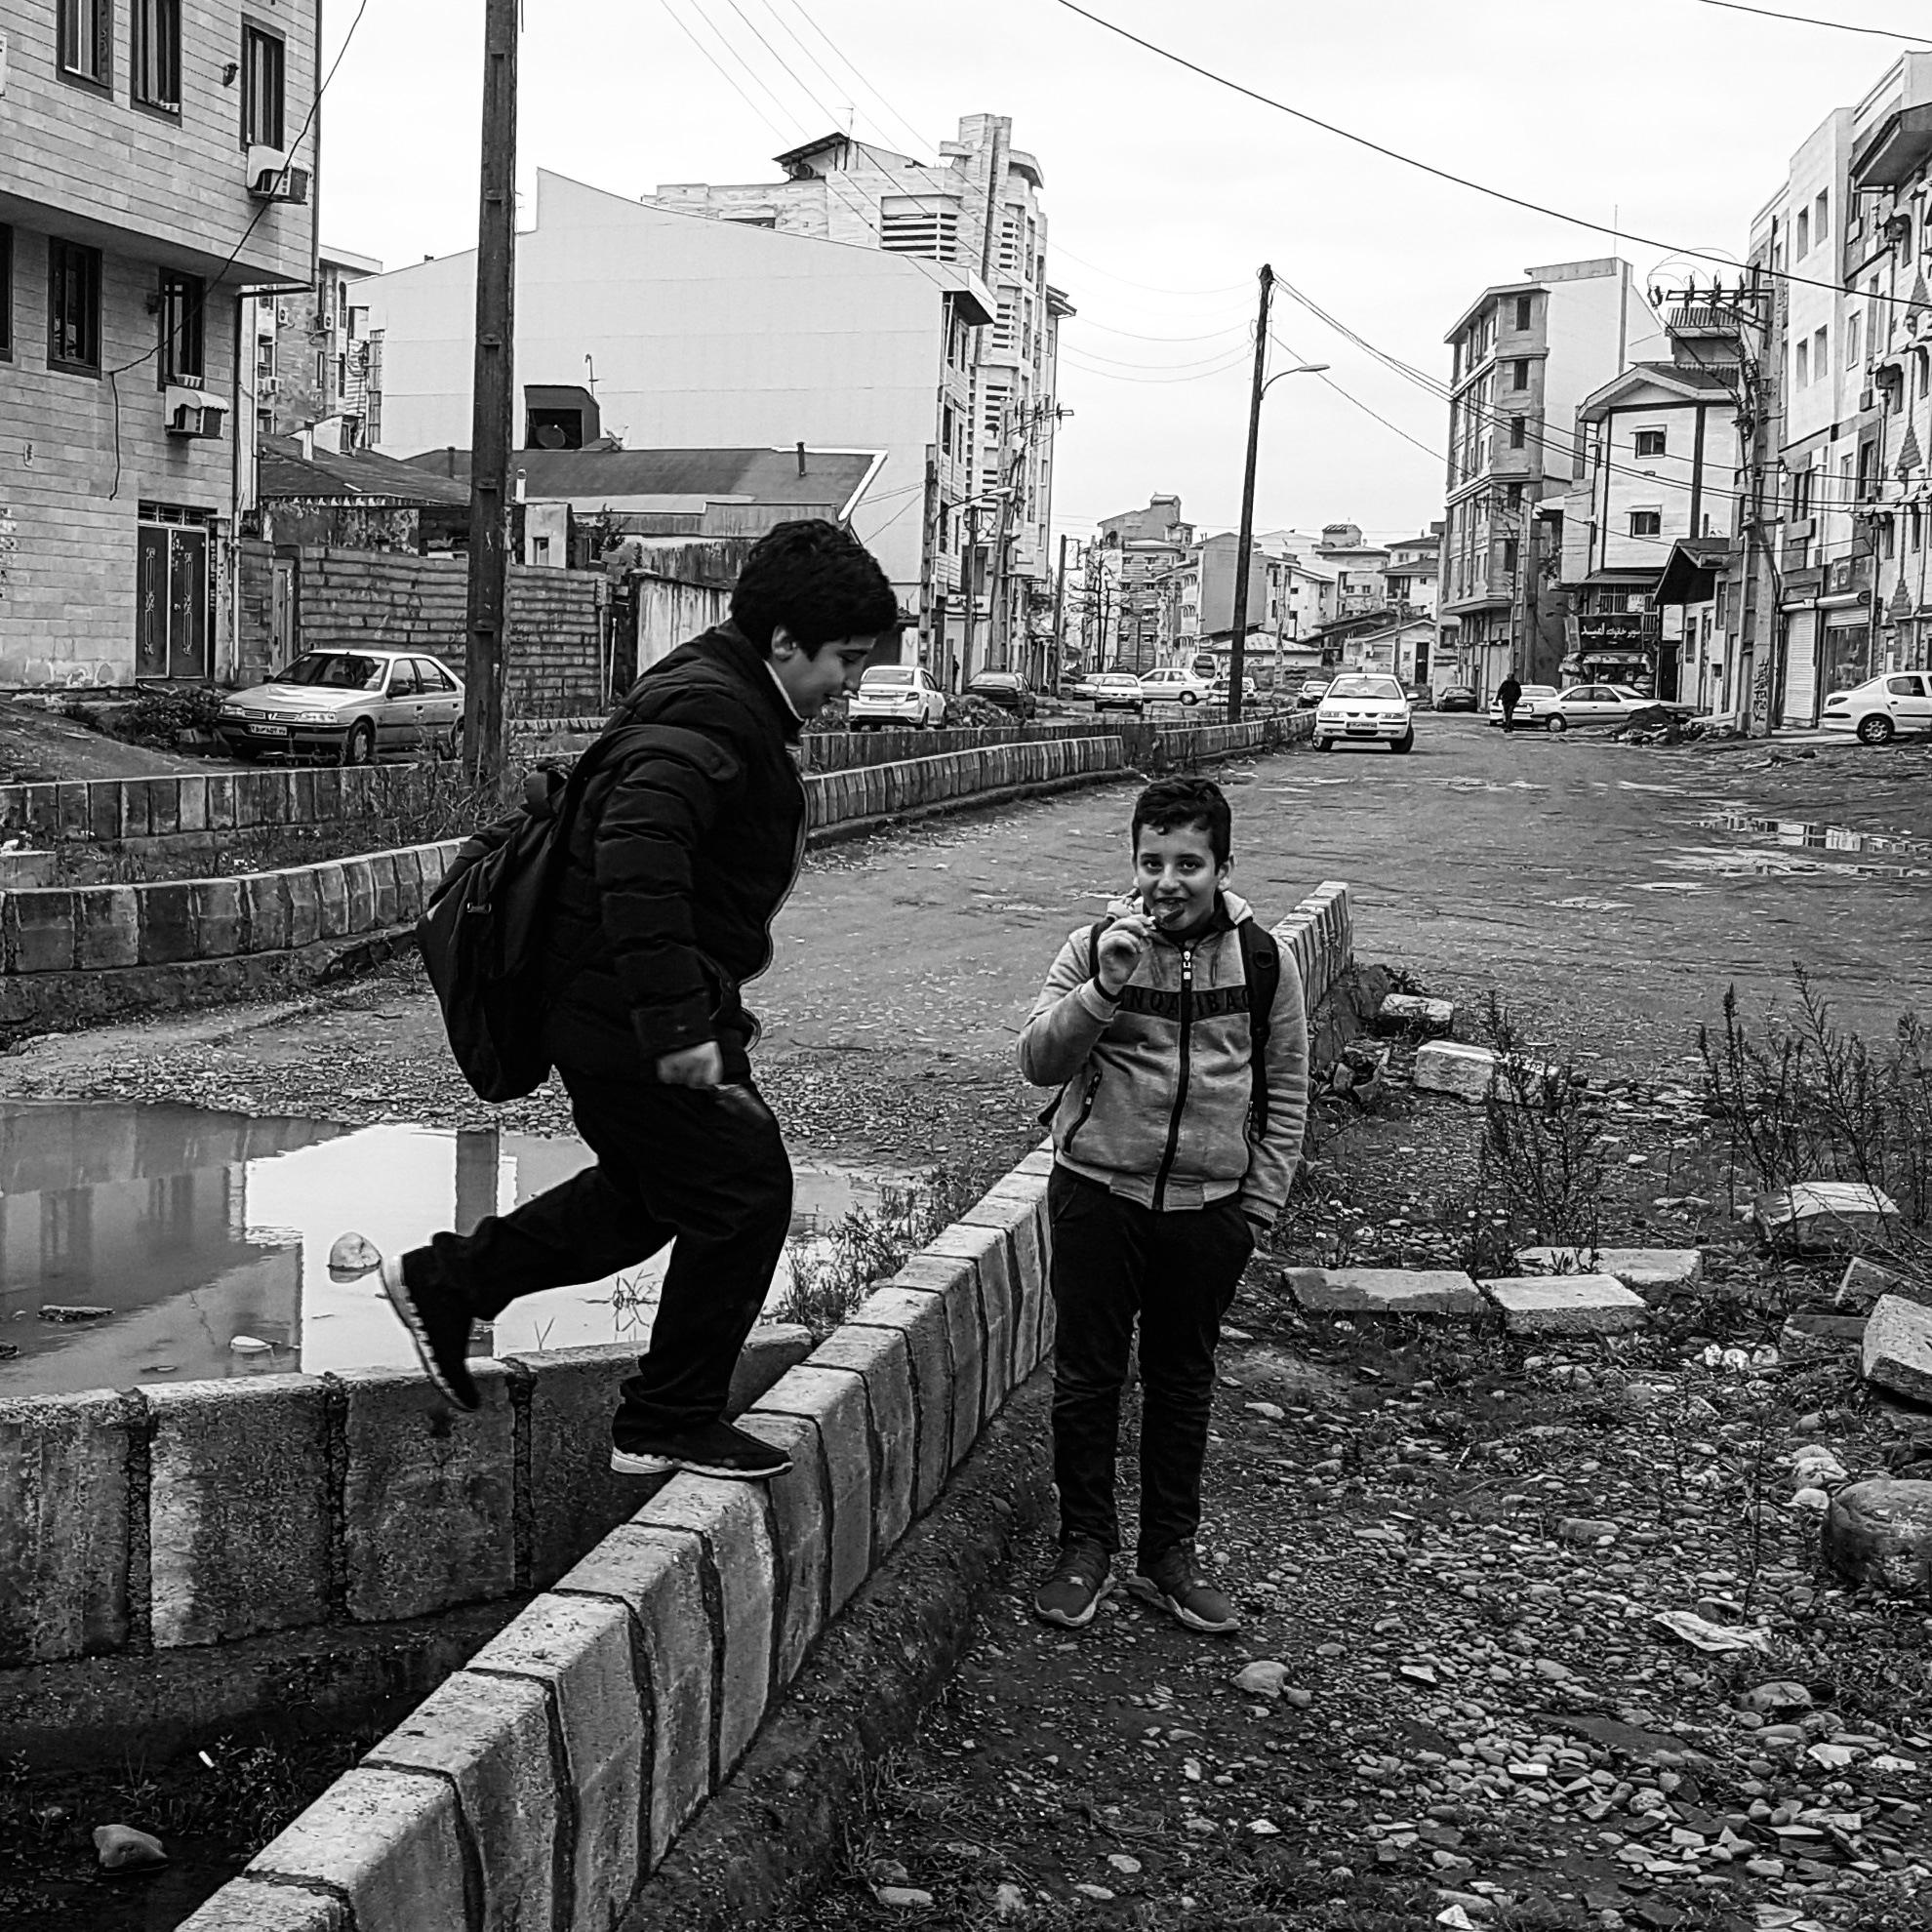 Untitled by taherikambiz